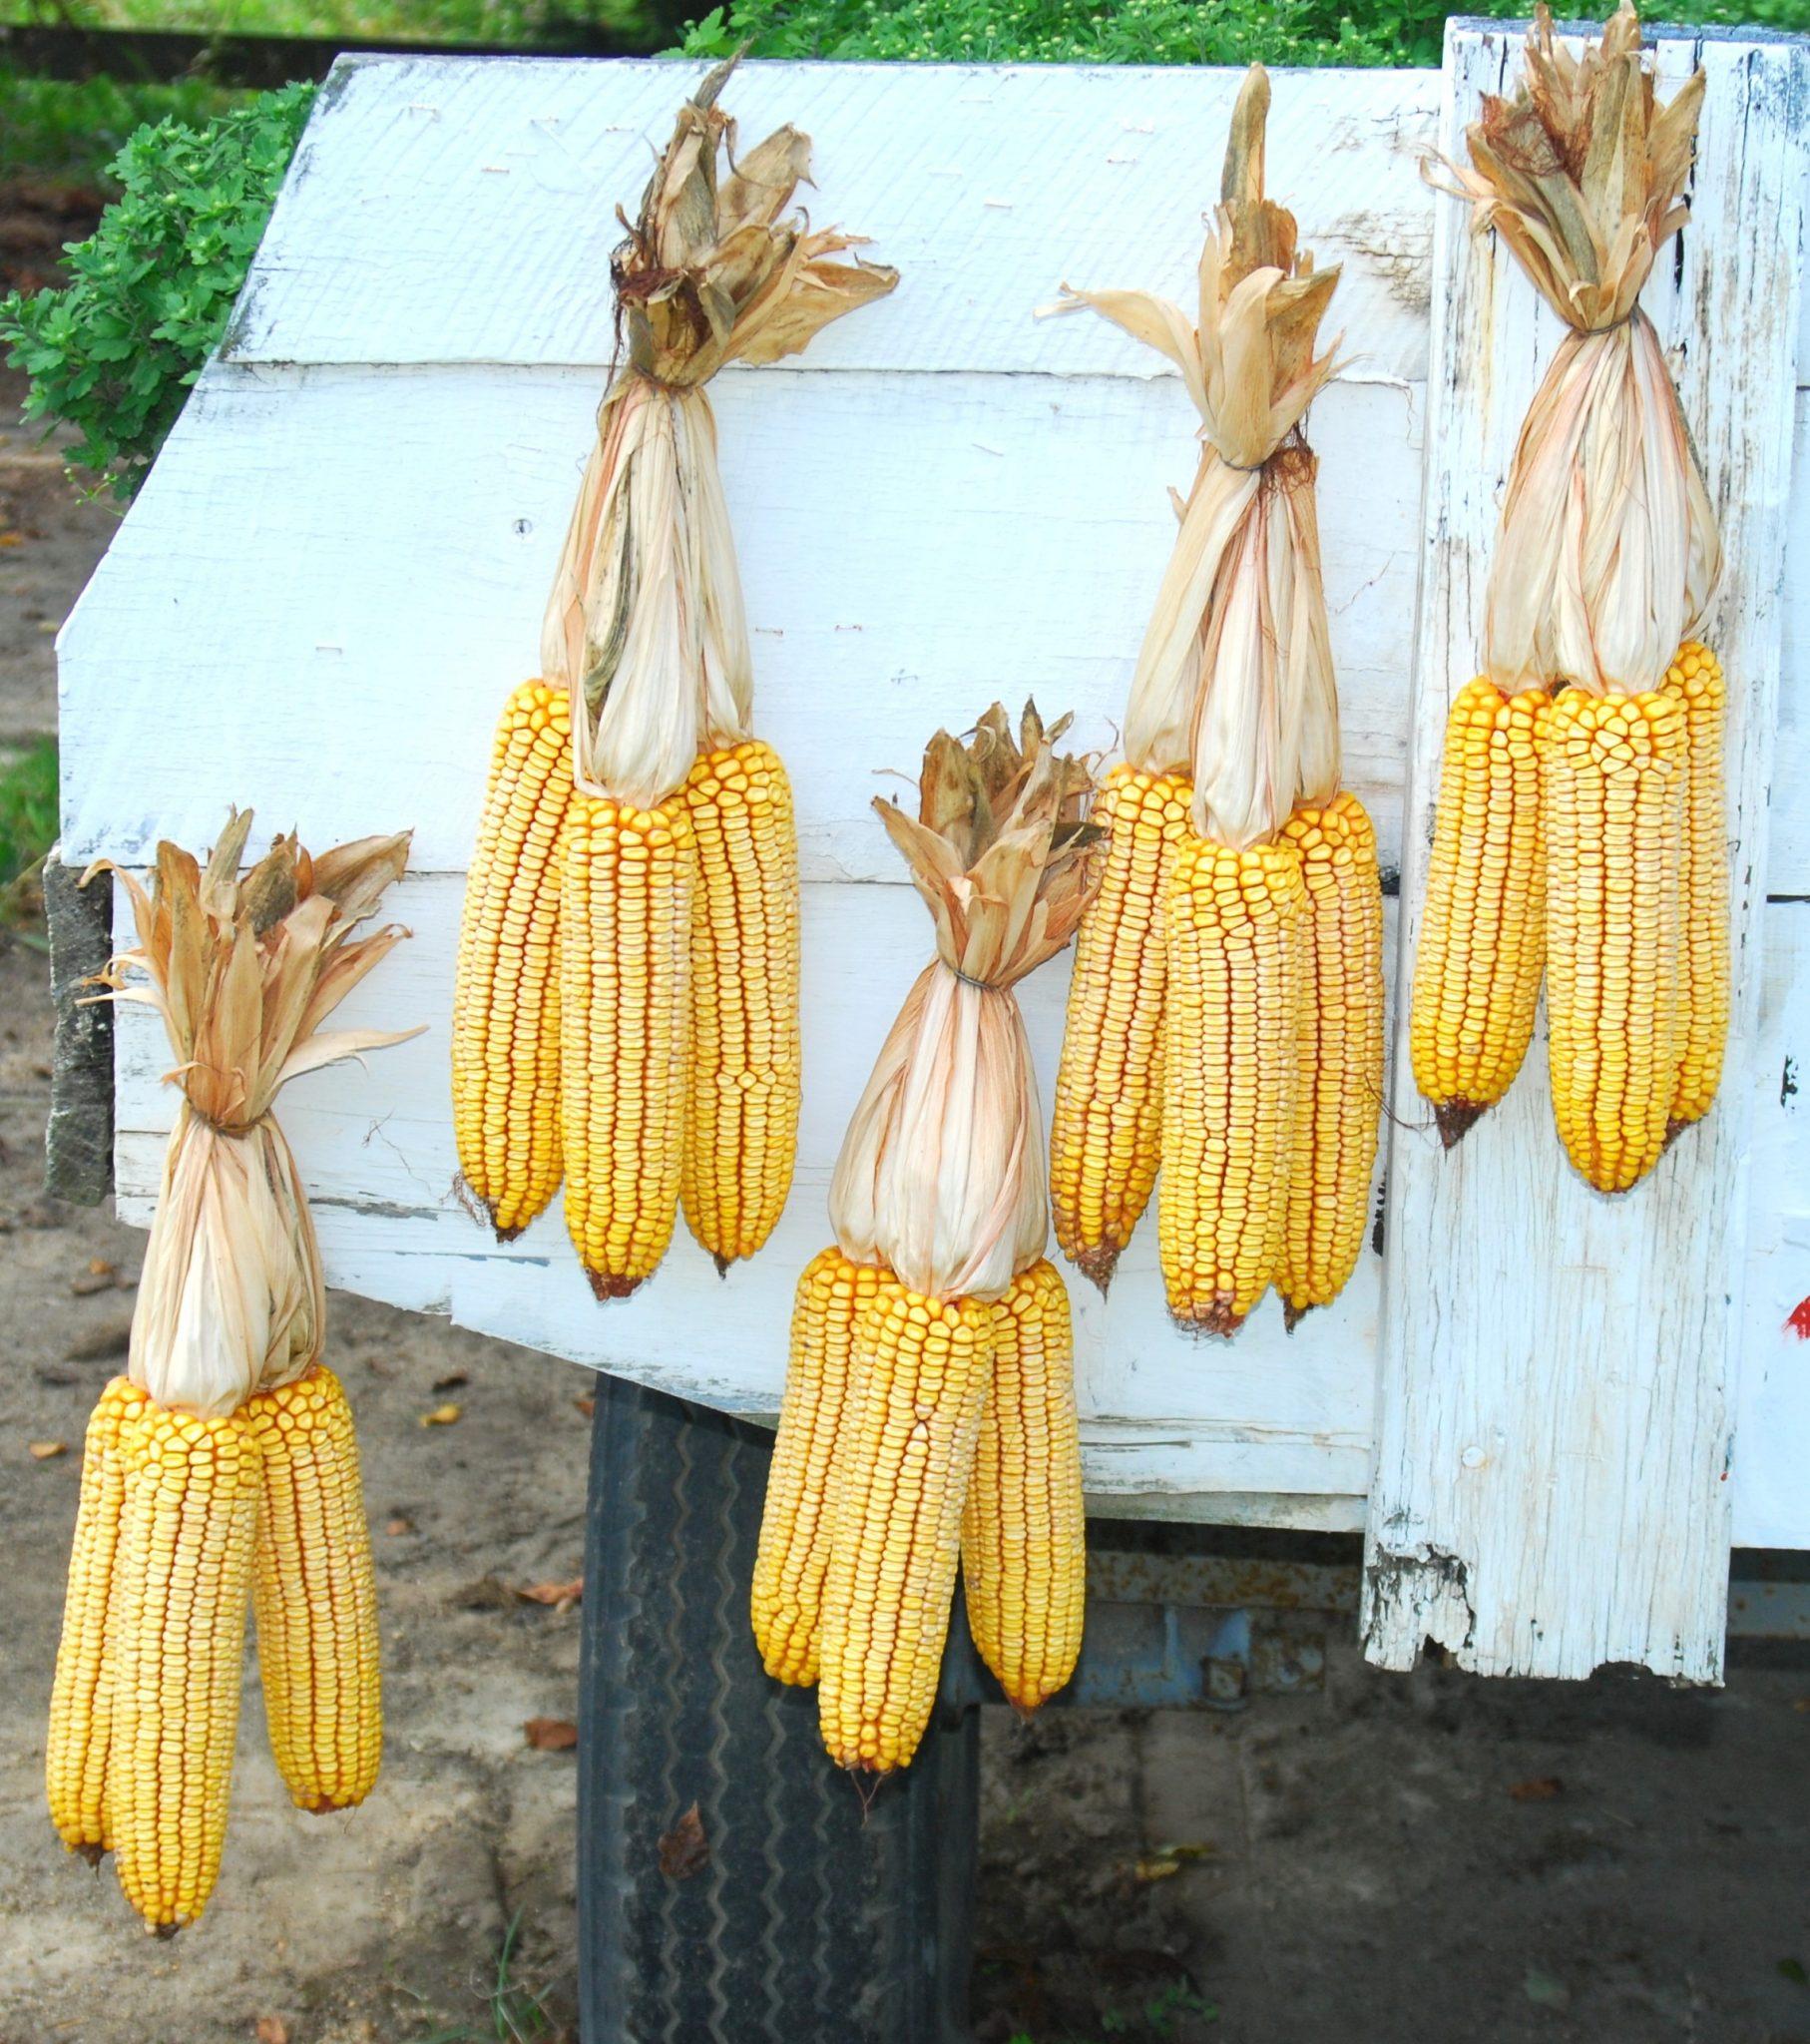 drying corn